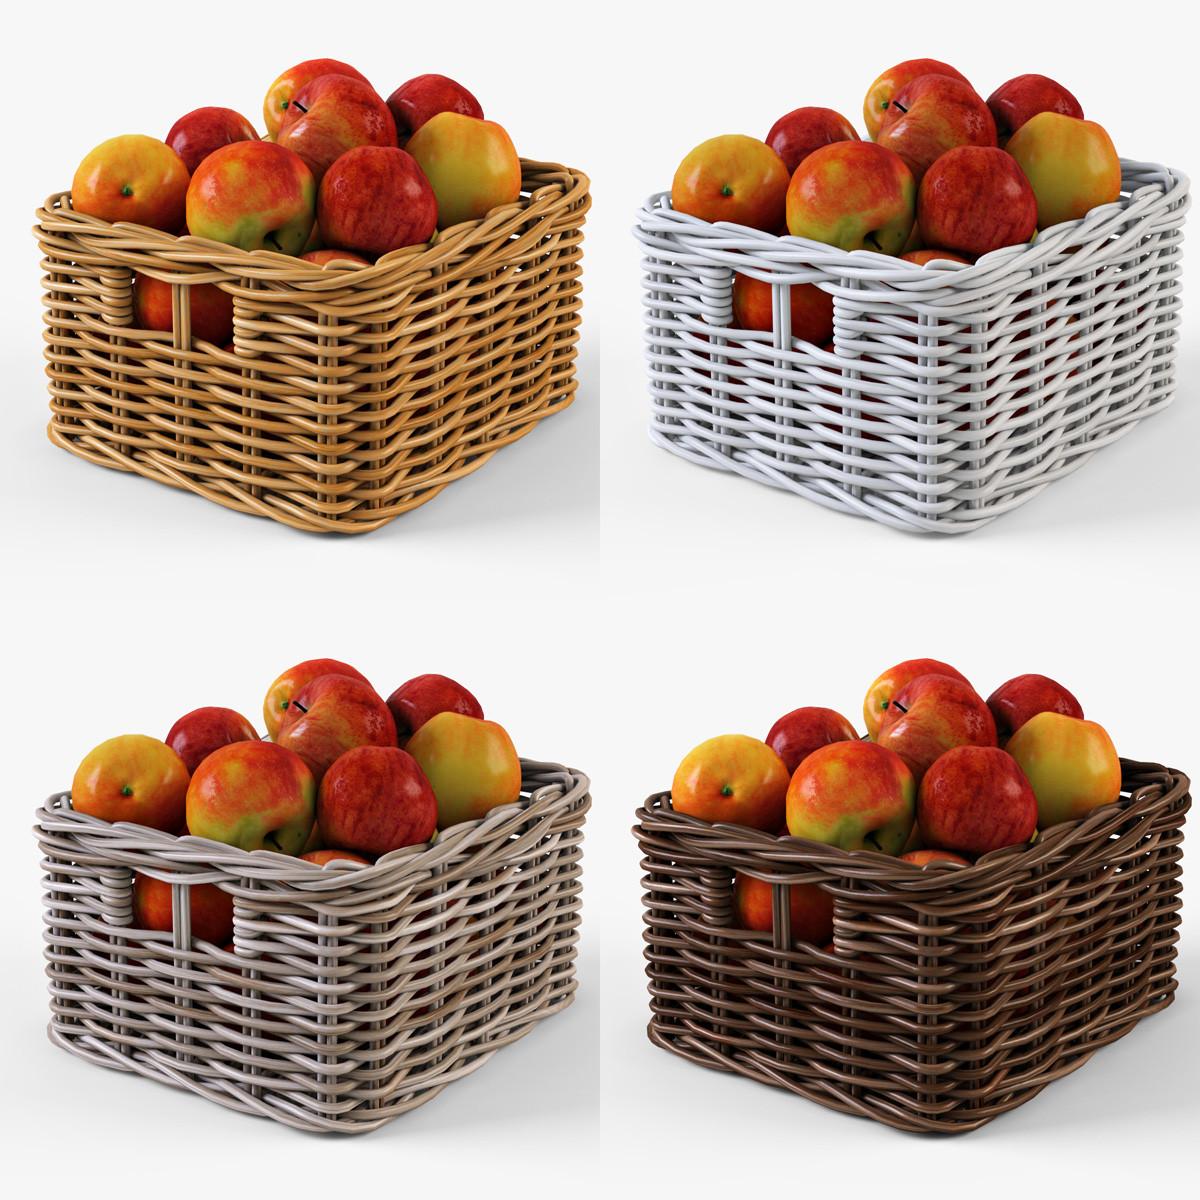 001(Ikea Byholma 1(4color)+Apple).jpg